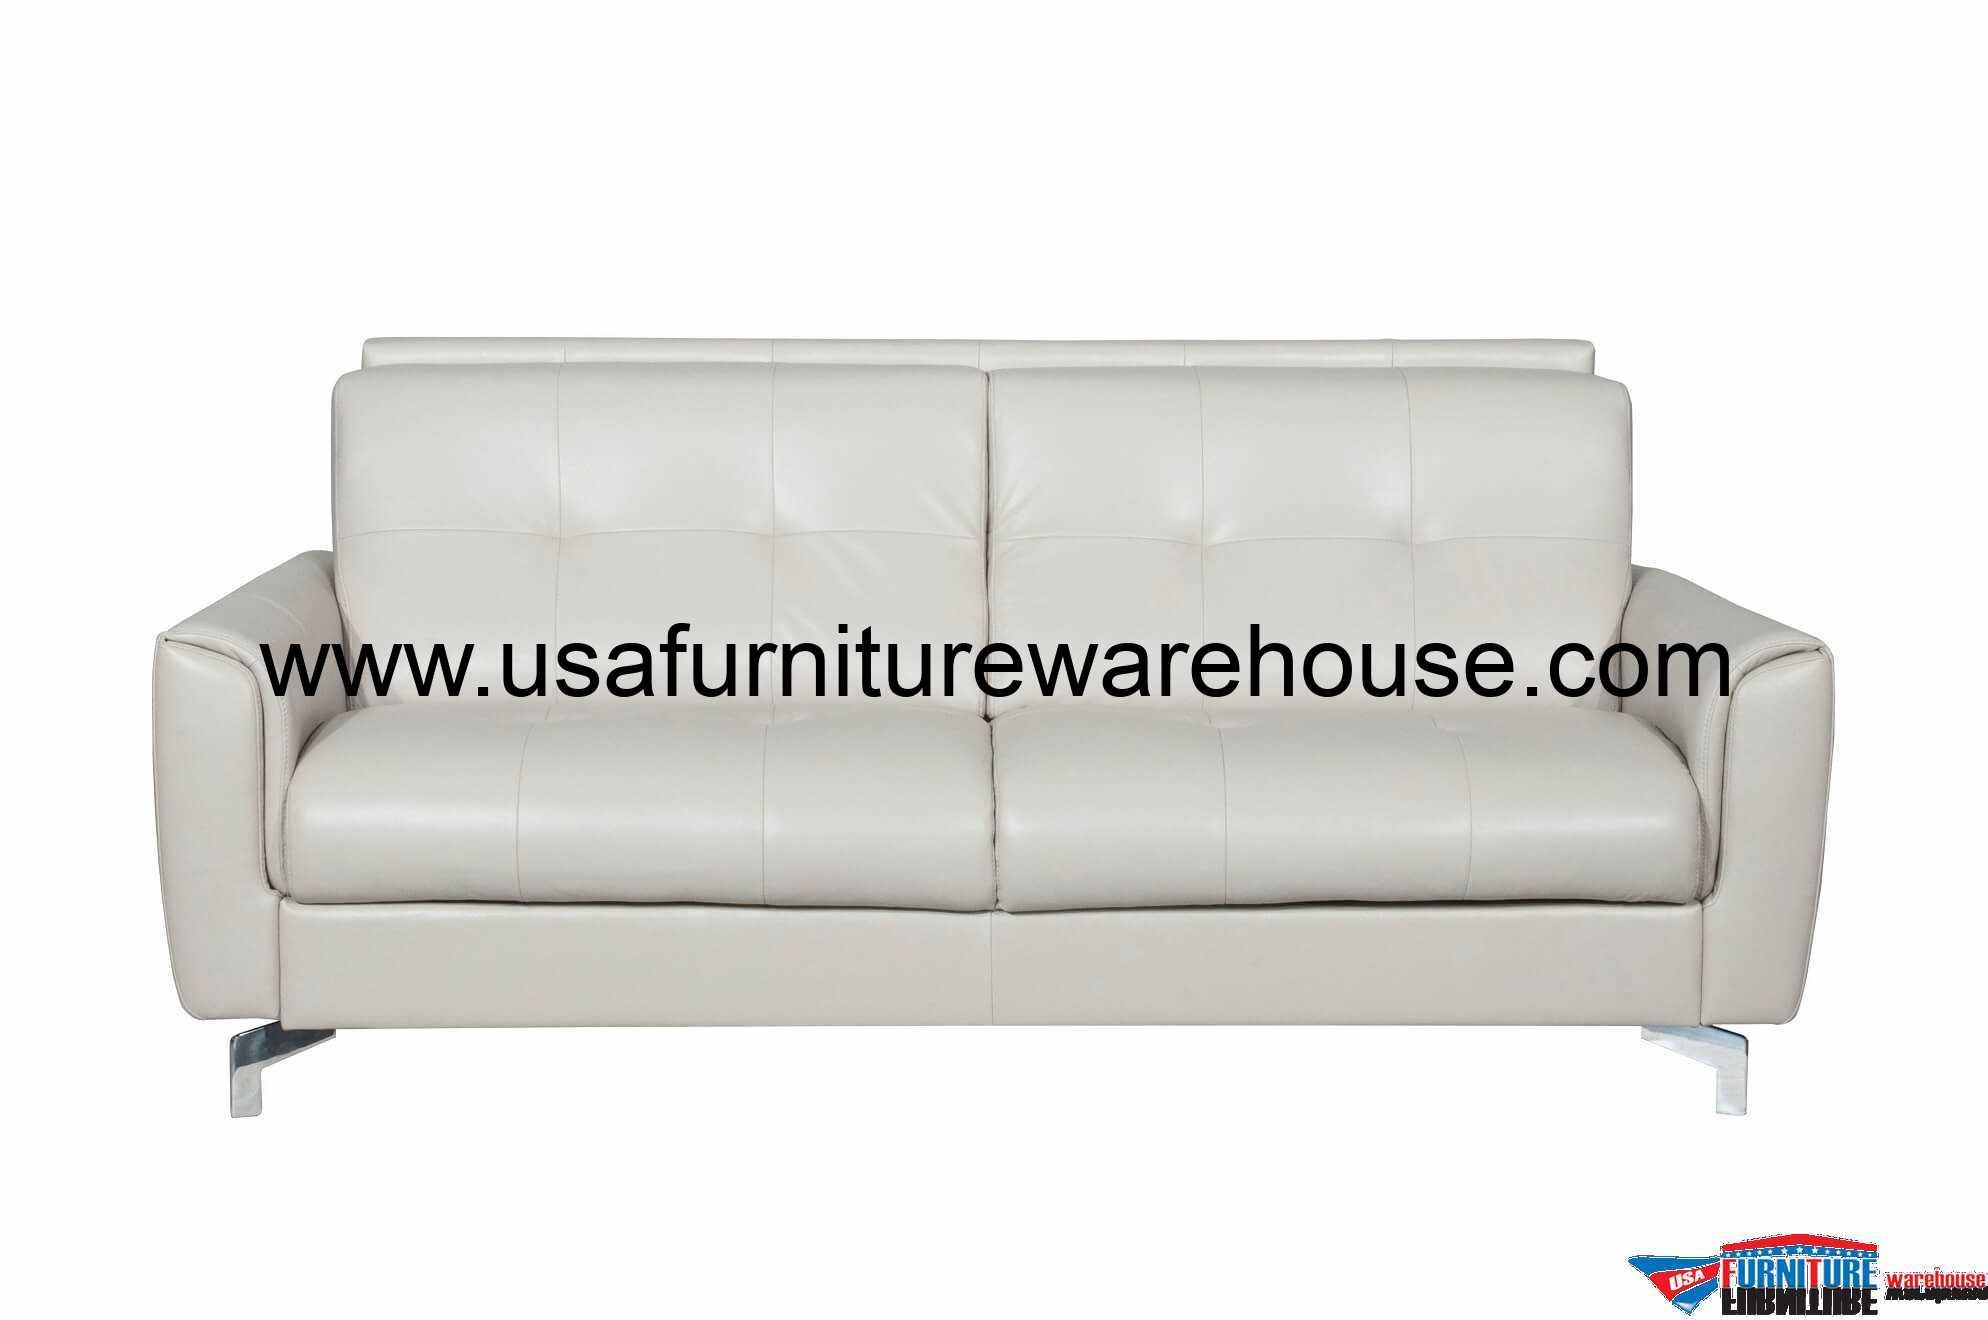 Benares Sand Top Grain Italian Leather Sleeper Sofa